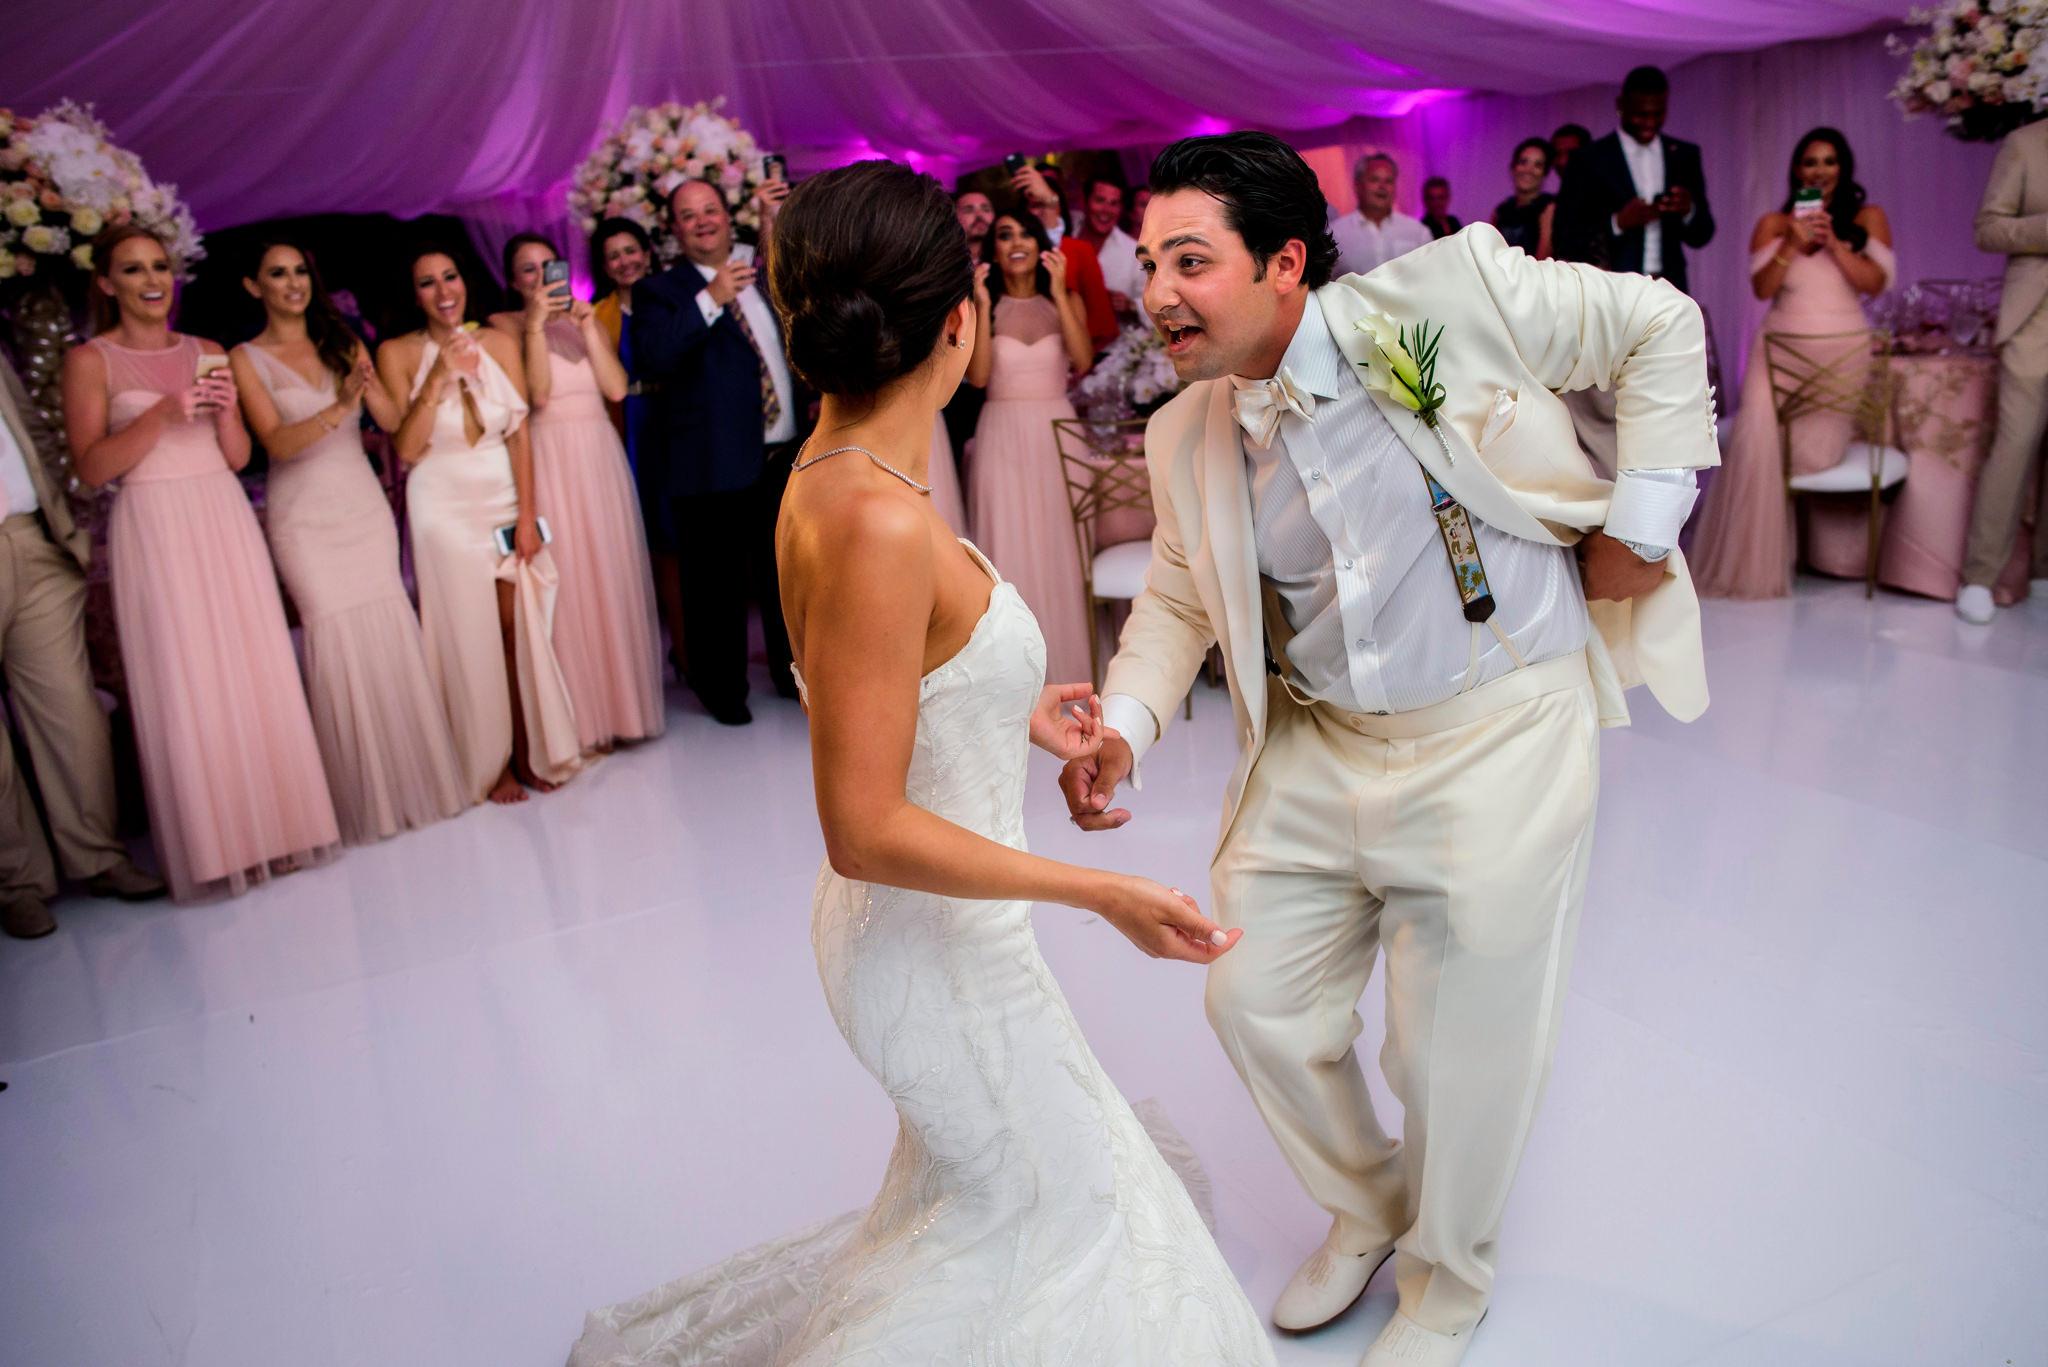 30-ashley-conner-four-seasons-resort-hualalai-wedding